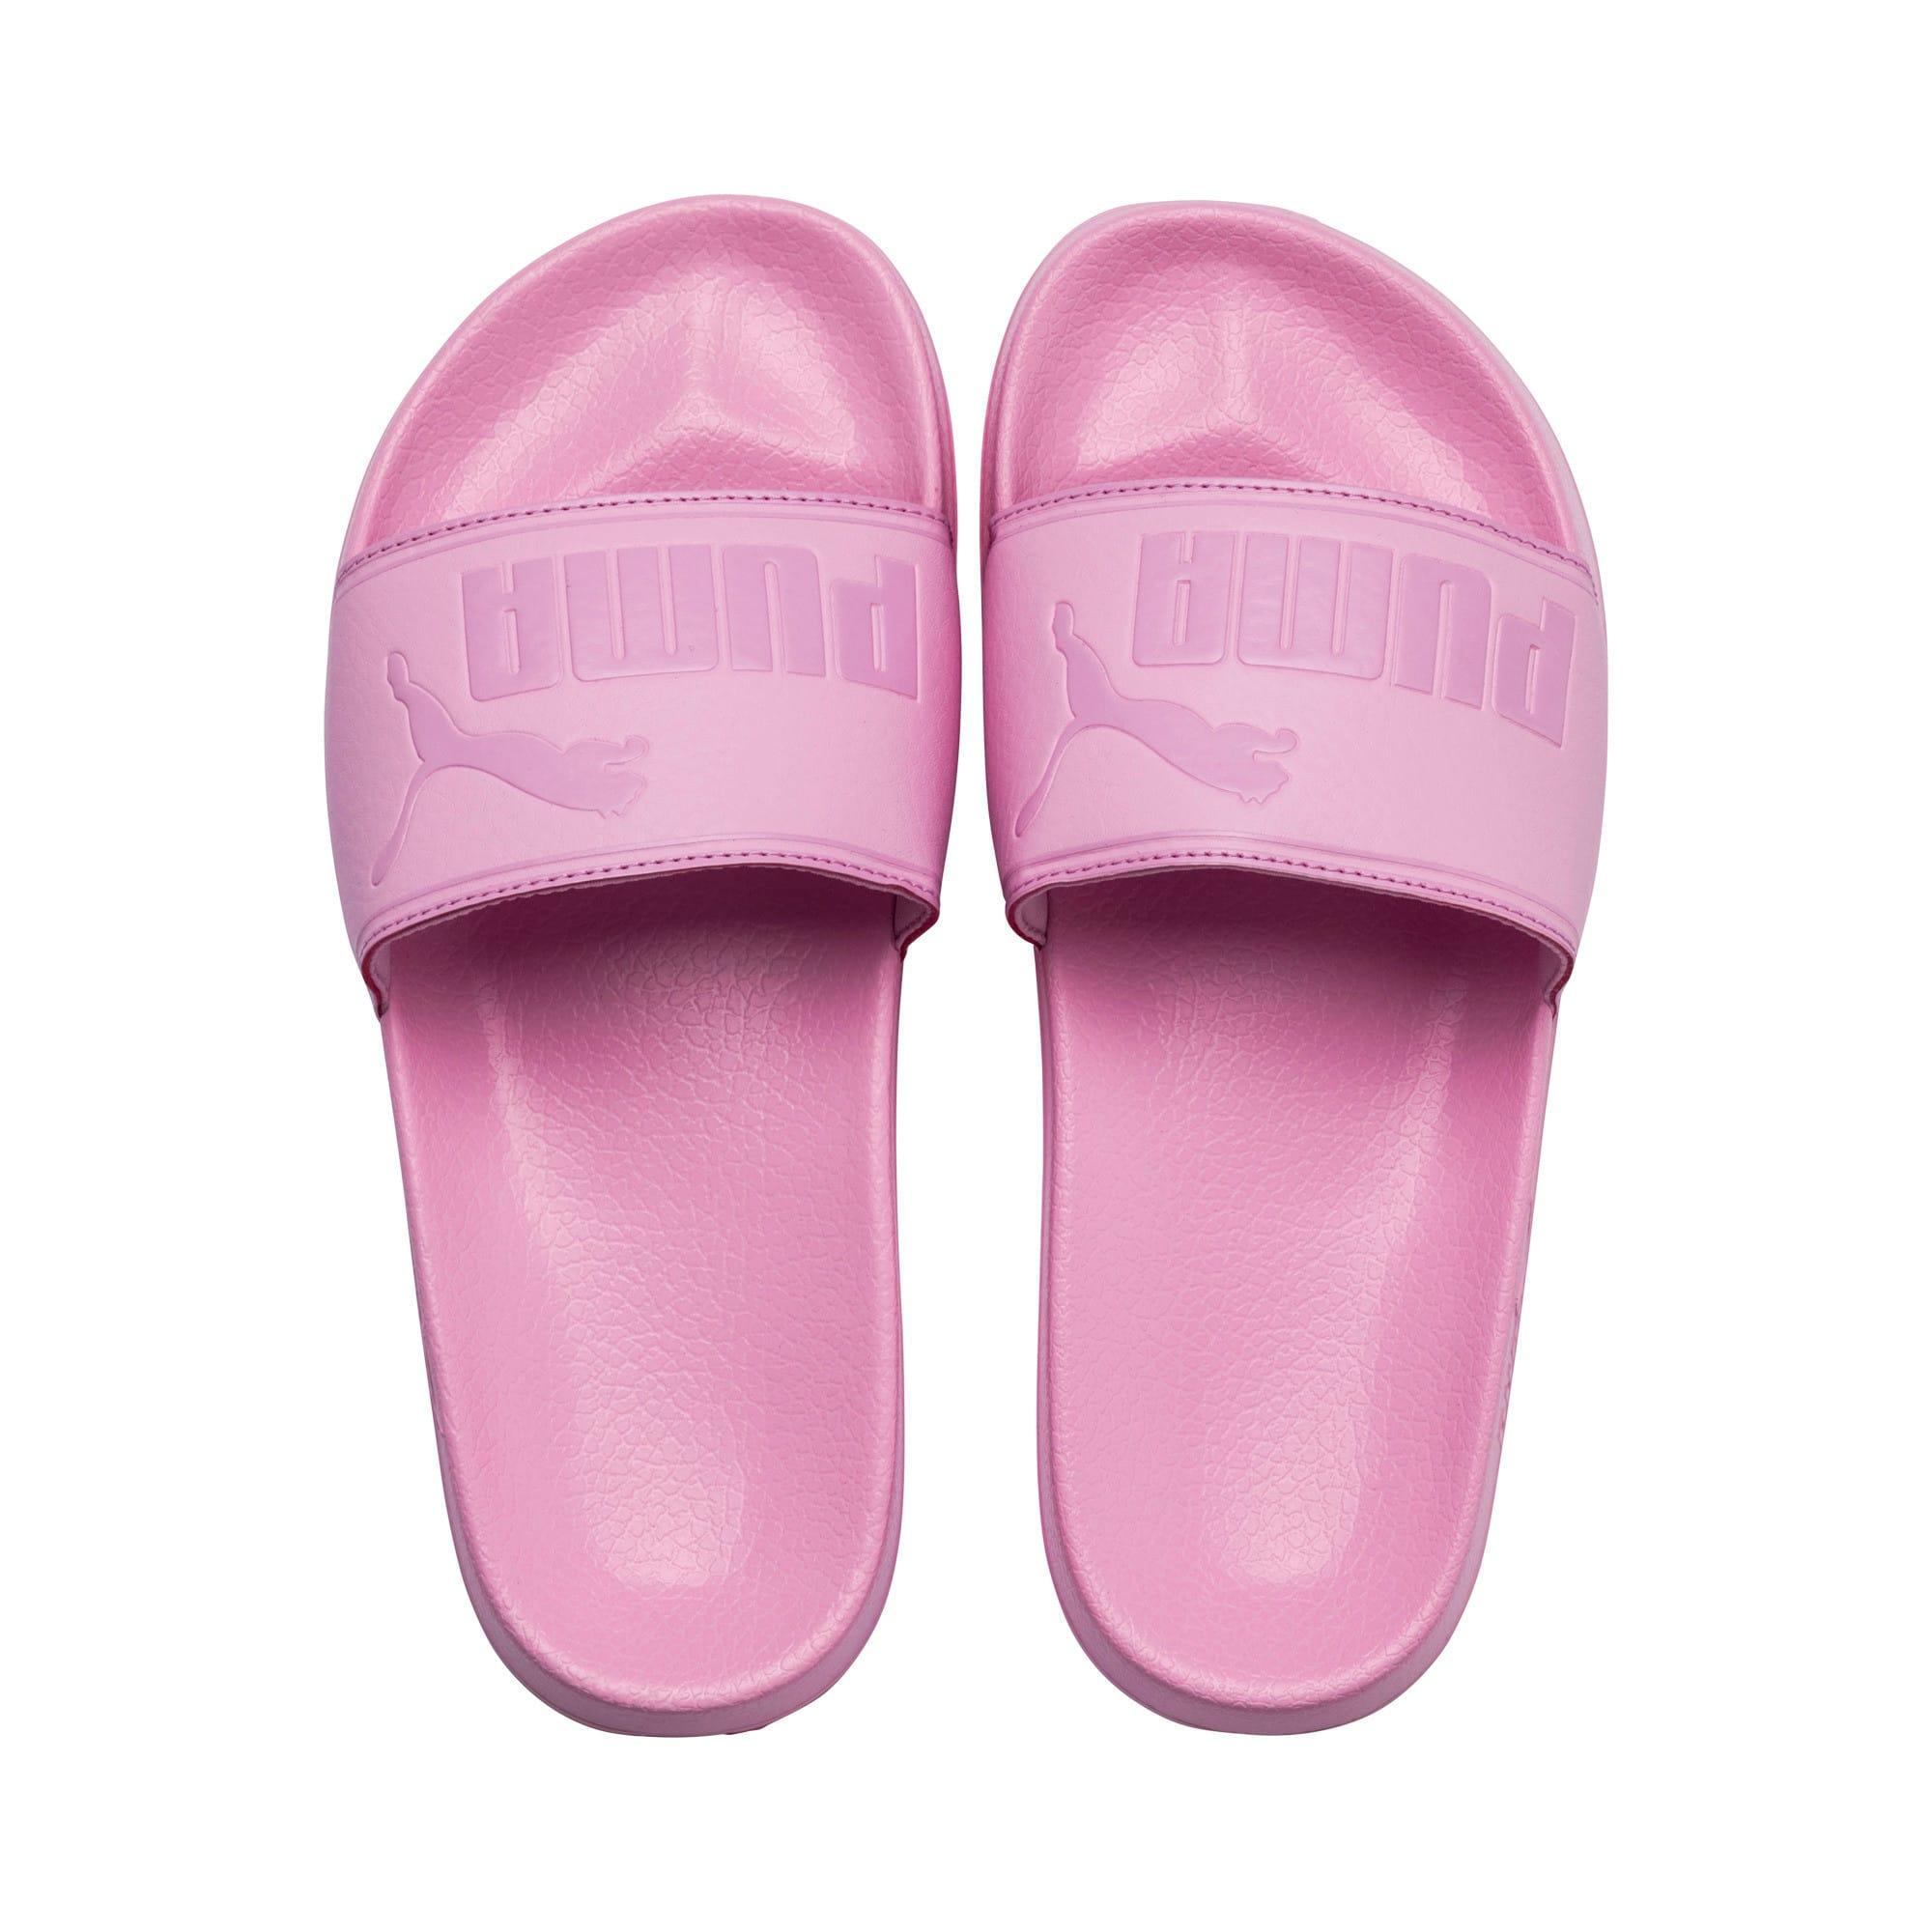 Thumbnail 6 of Leadcat Sandals, Pale Pink-Pale Pink, medium